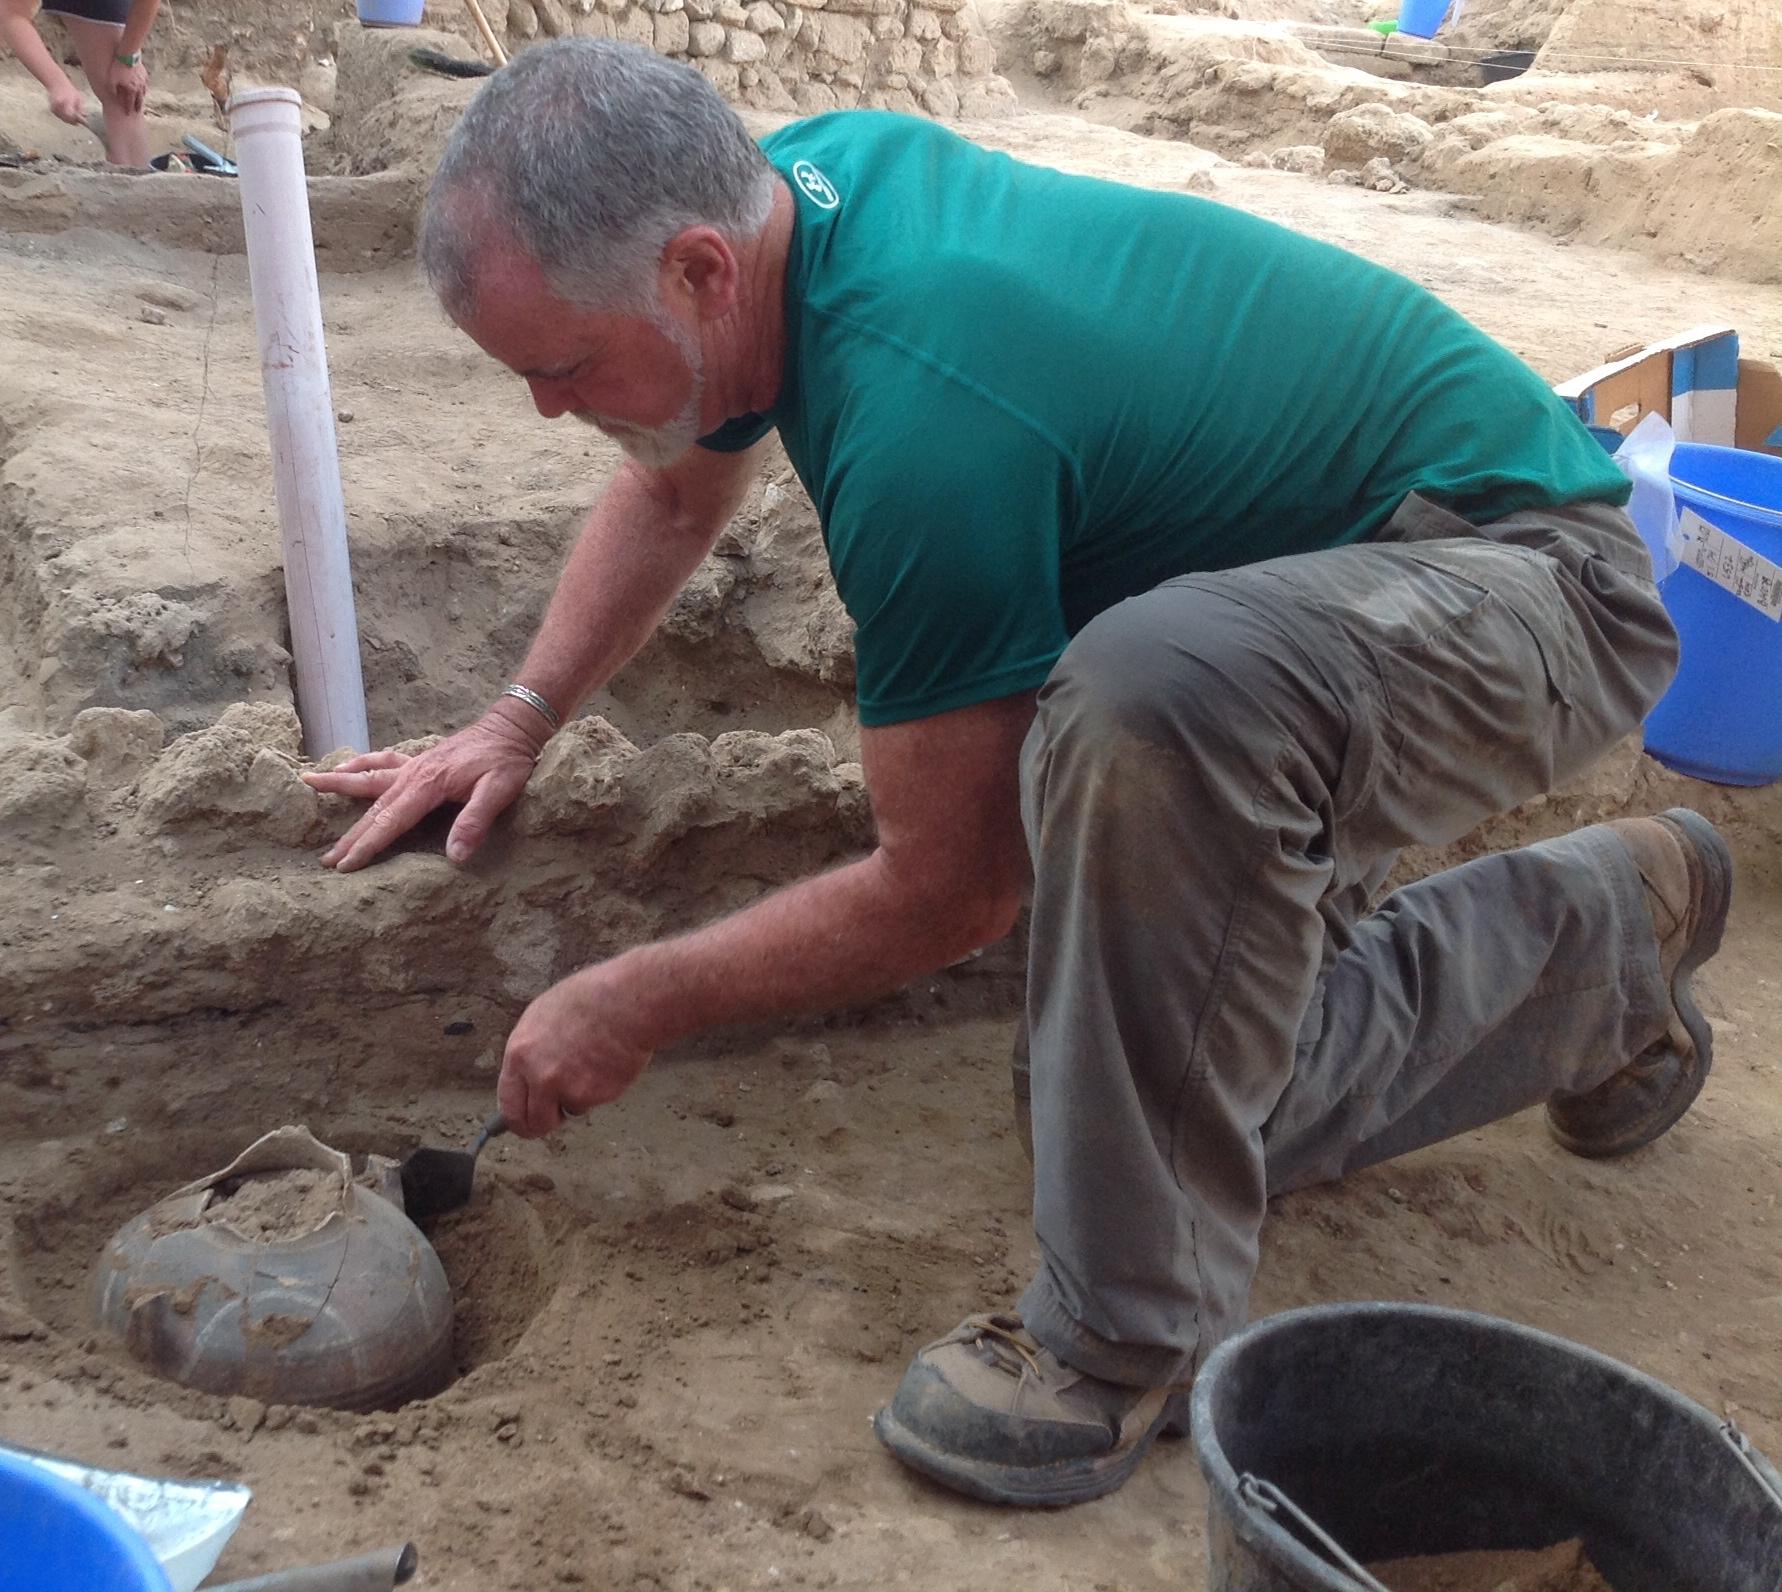 Excavating a sunken jar